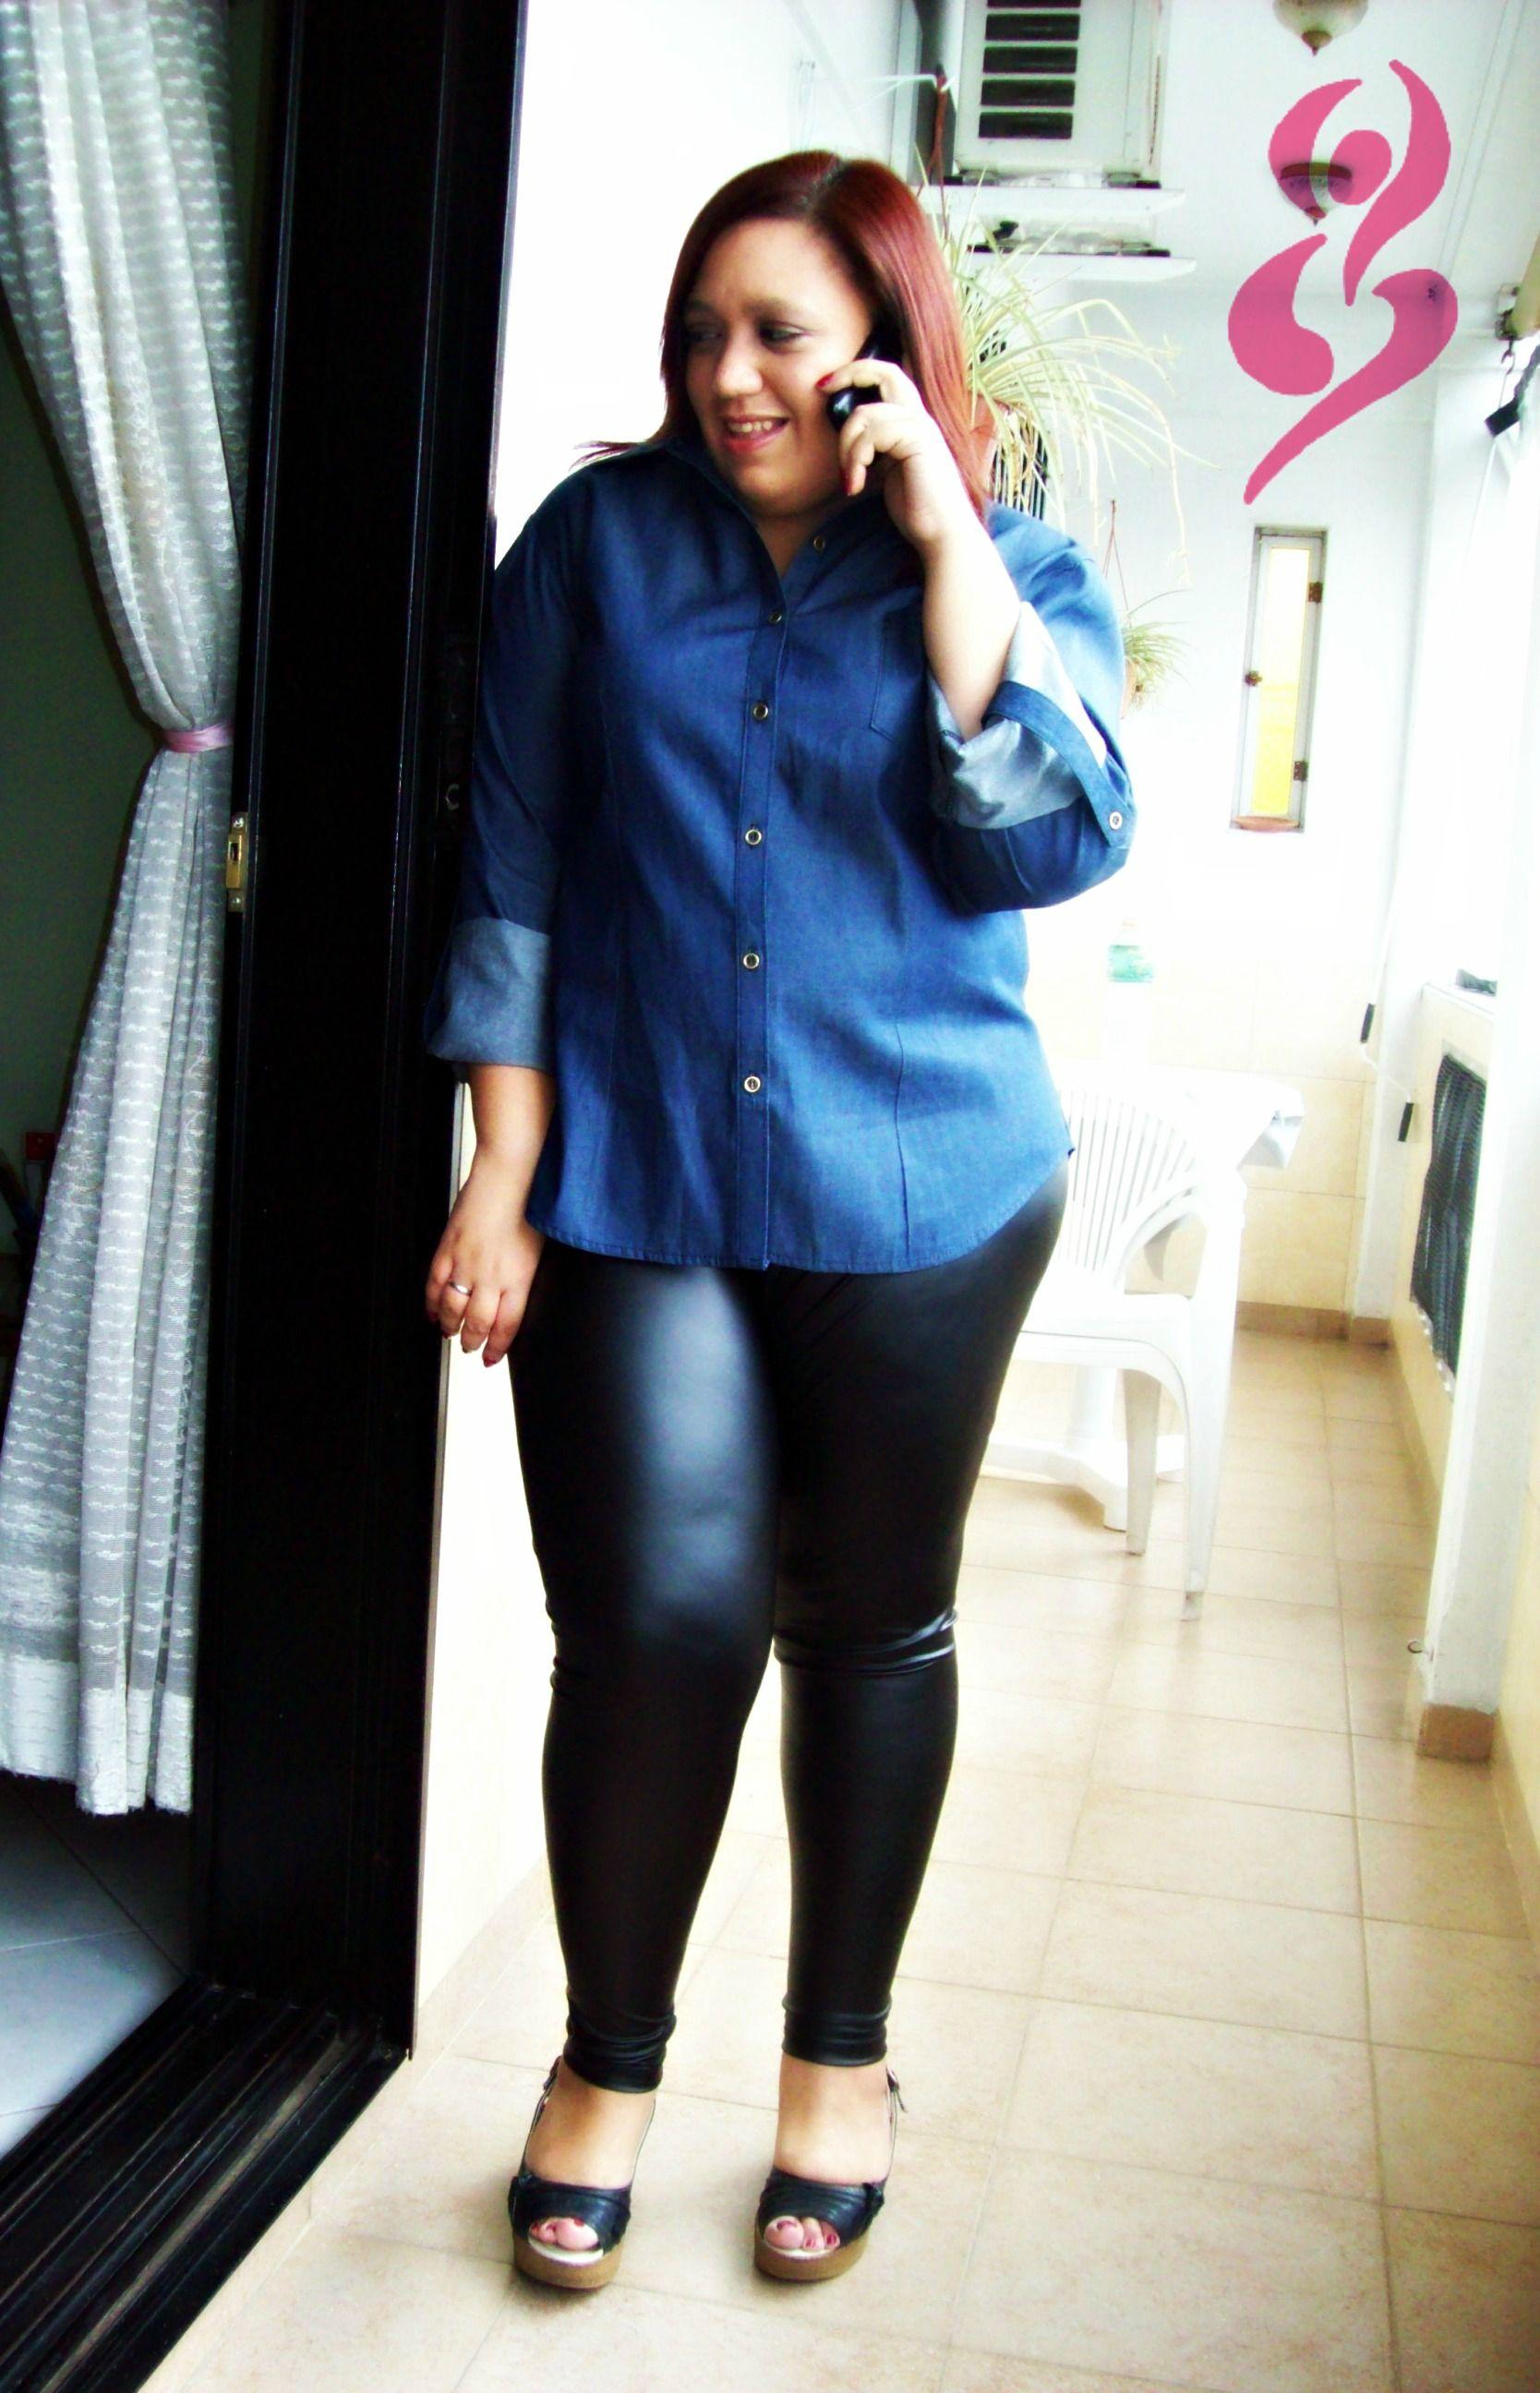 Camisa de denim y calzas negras de símil cuero http://on.fb.me/134oBWS #fatshion #plus #size #shirt #leggins #camisa #calza #denim #black #negro